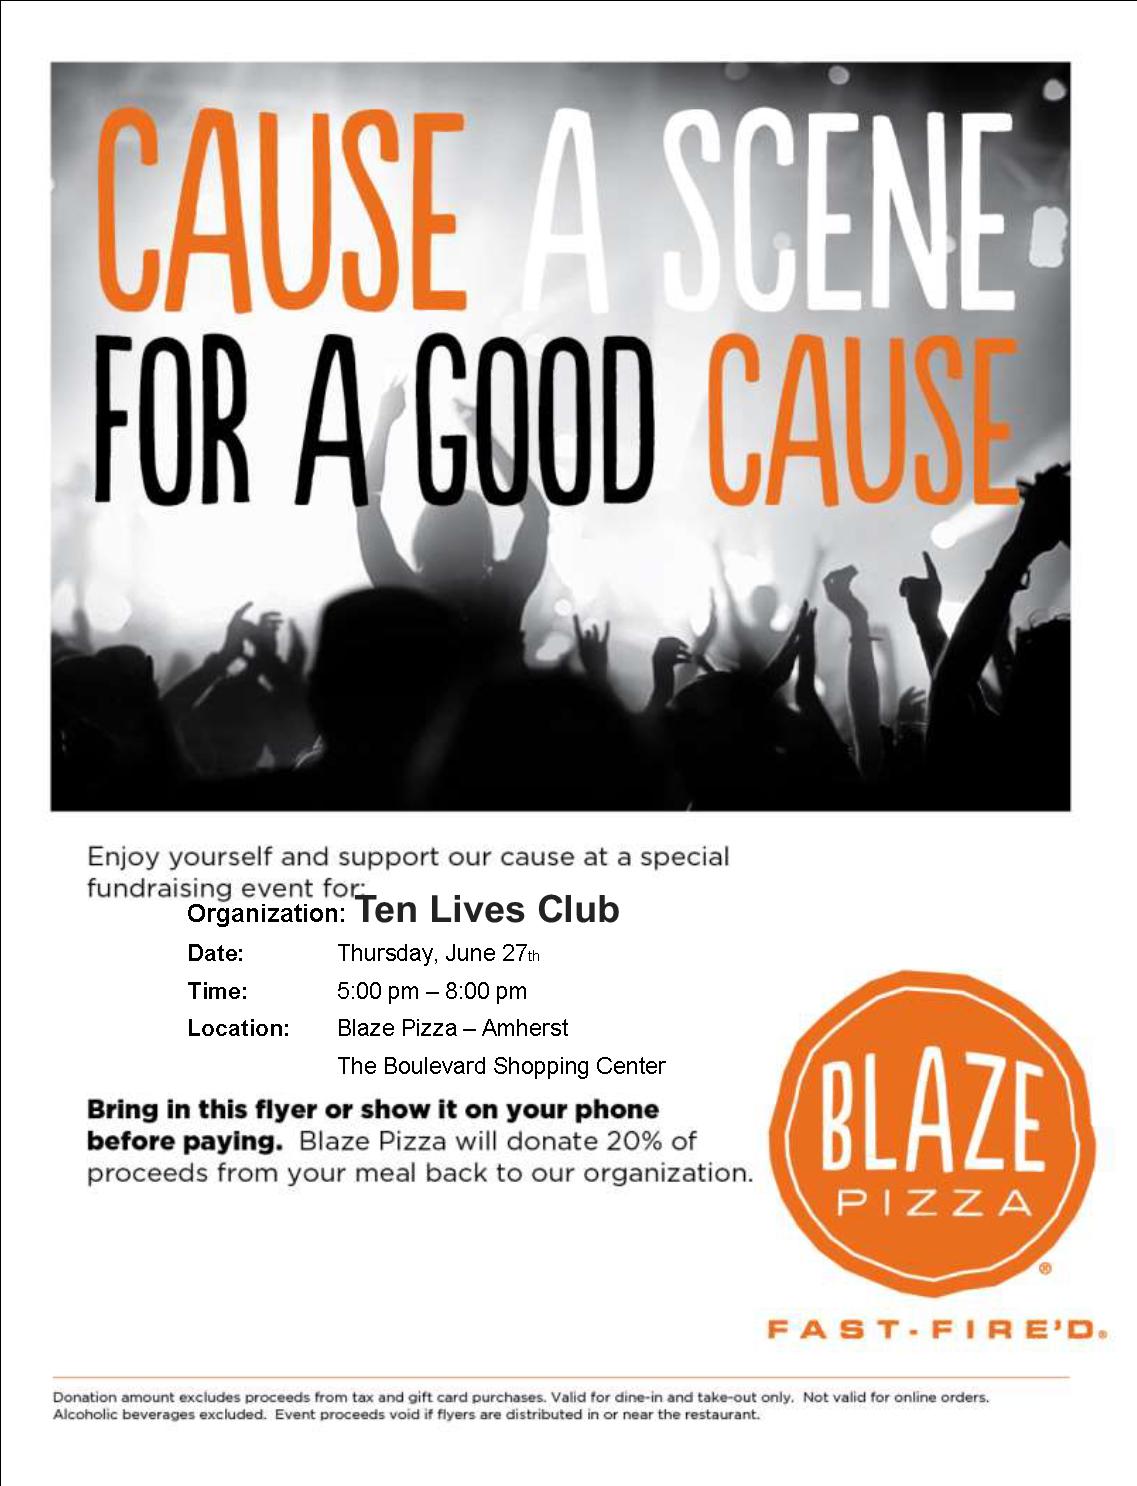 Blaze Pizza Flyer.png